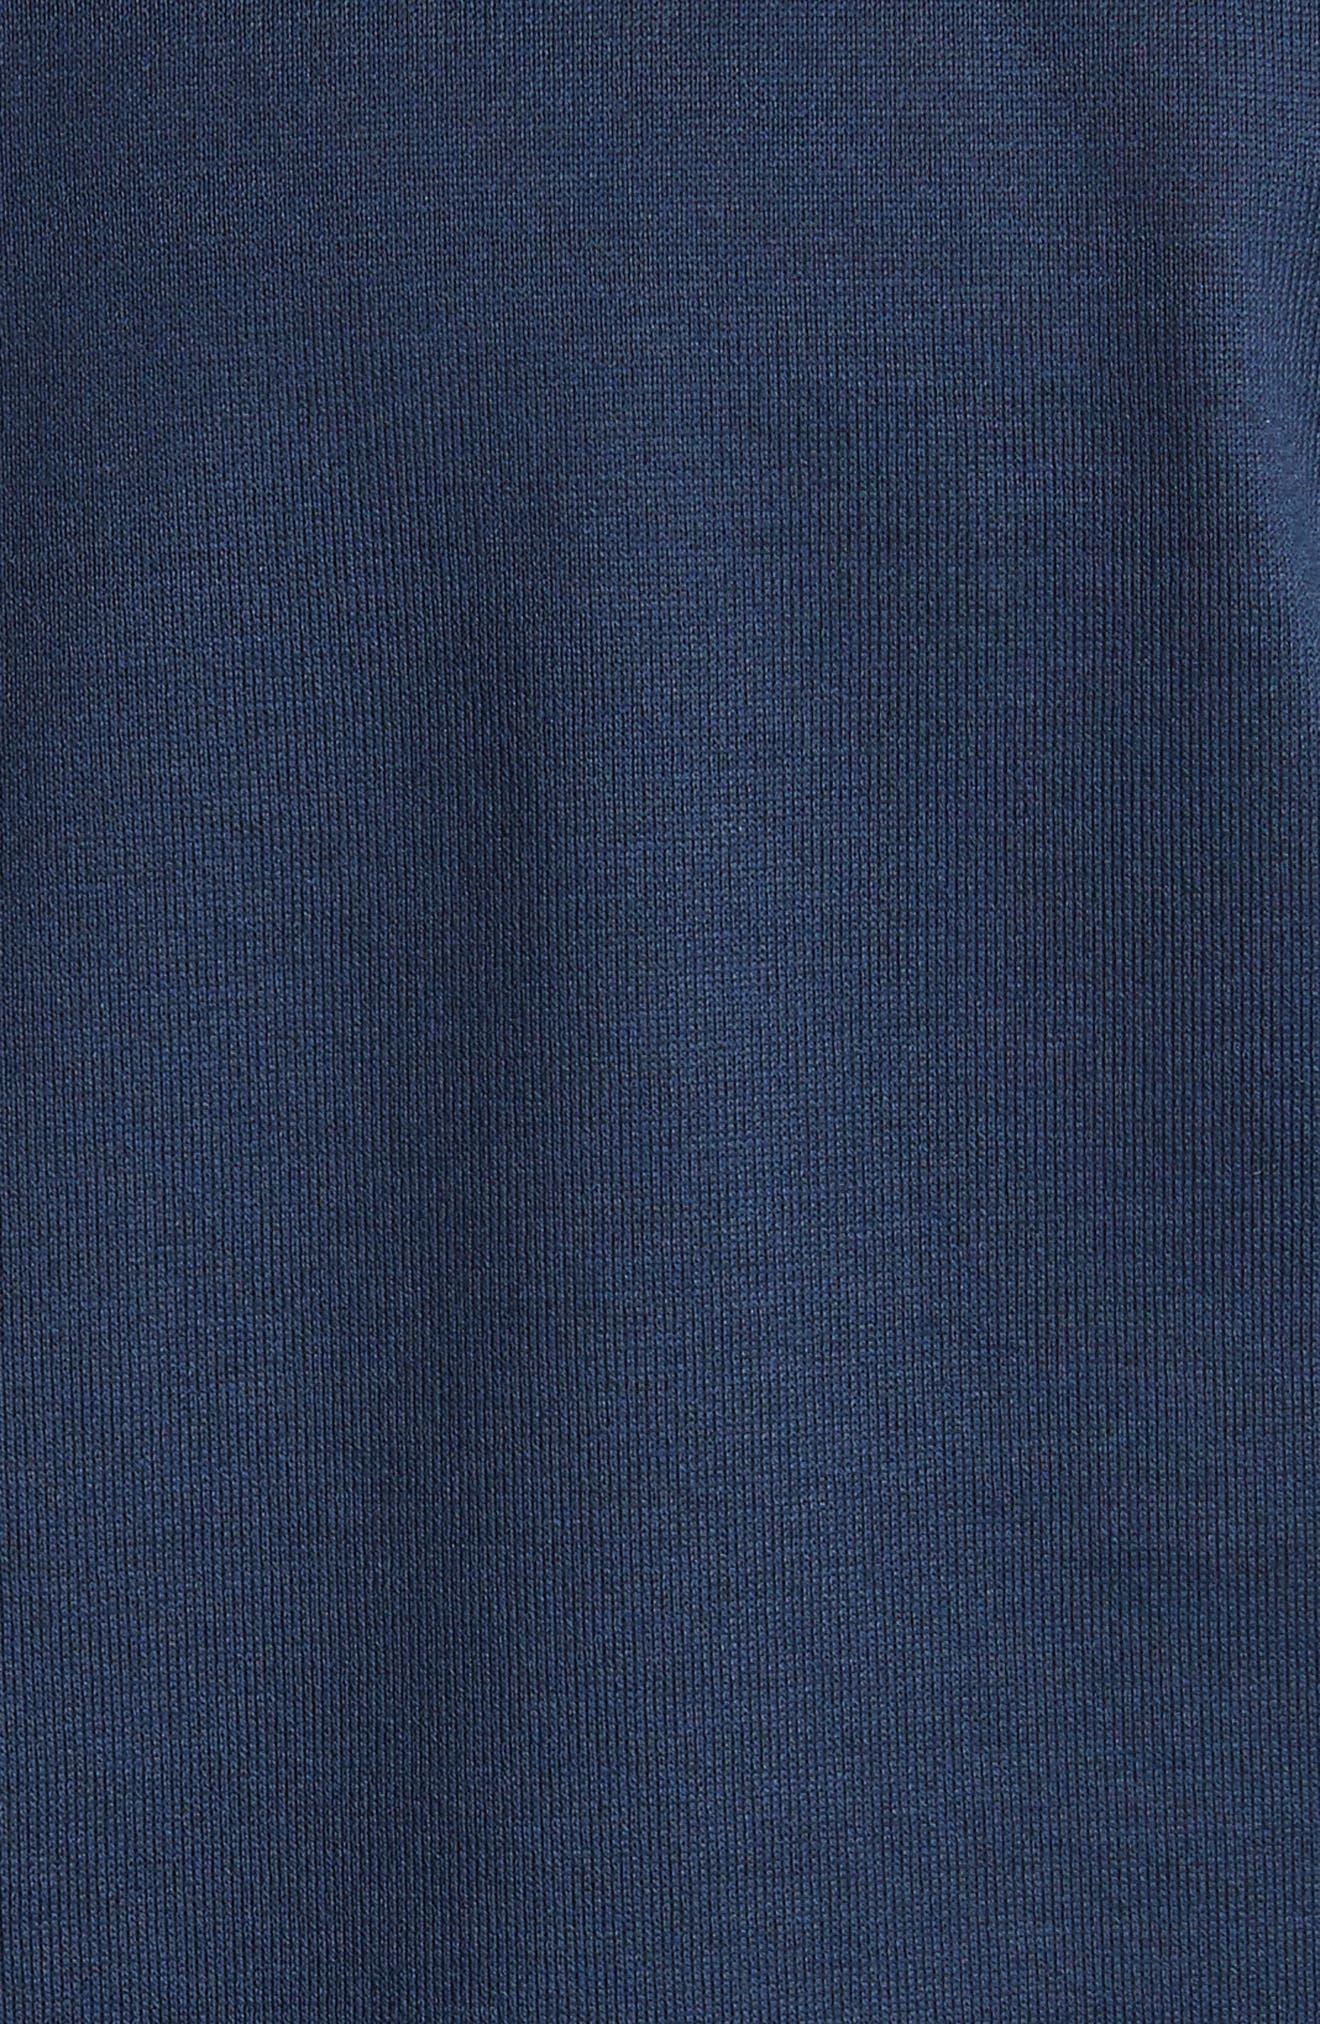 Niels N-Logo T-Shirt,                             Alternate thumbnail 5, color,                             Dark Navy